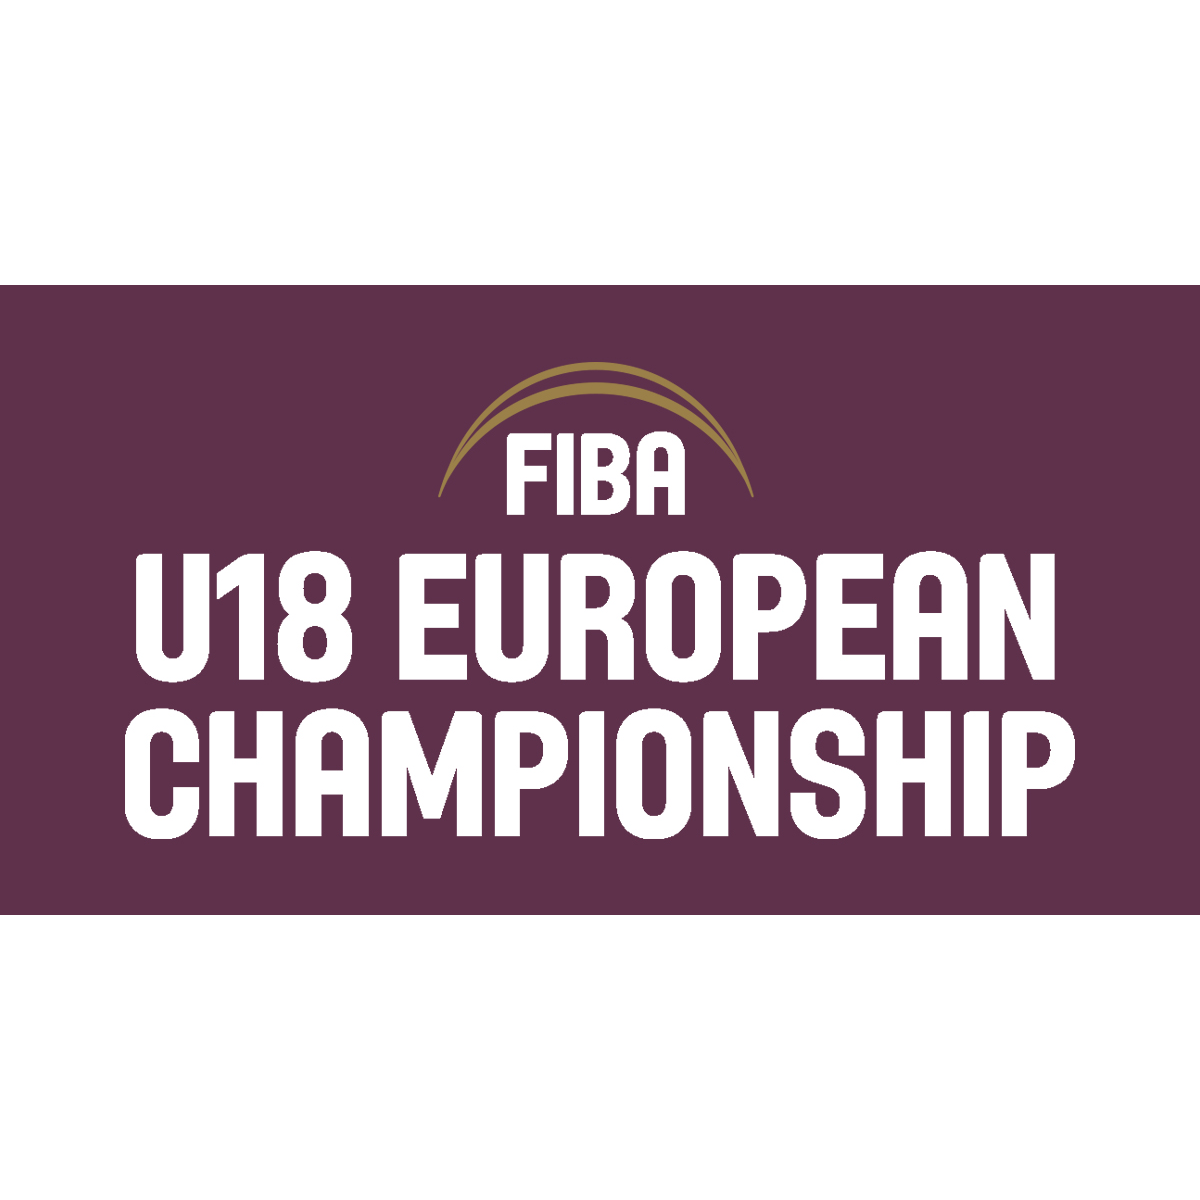 2020 FIBA U18 European Basketball Championship - Division B